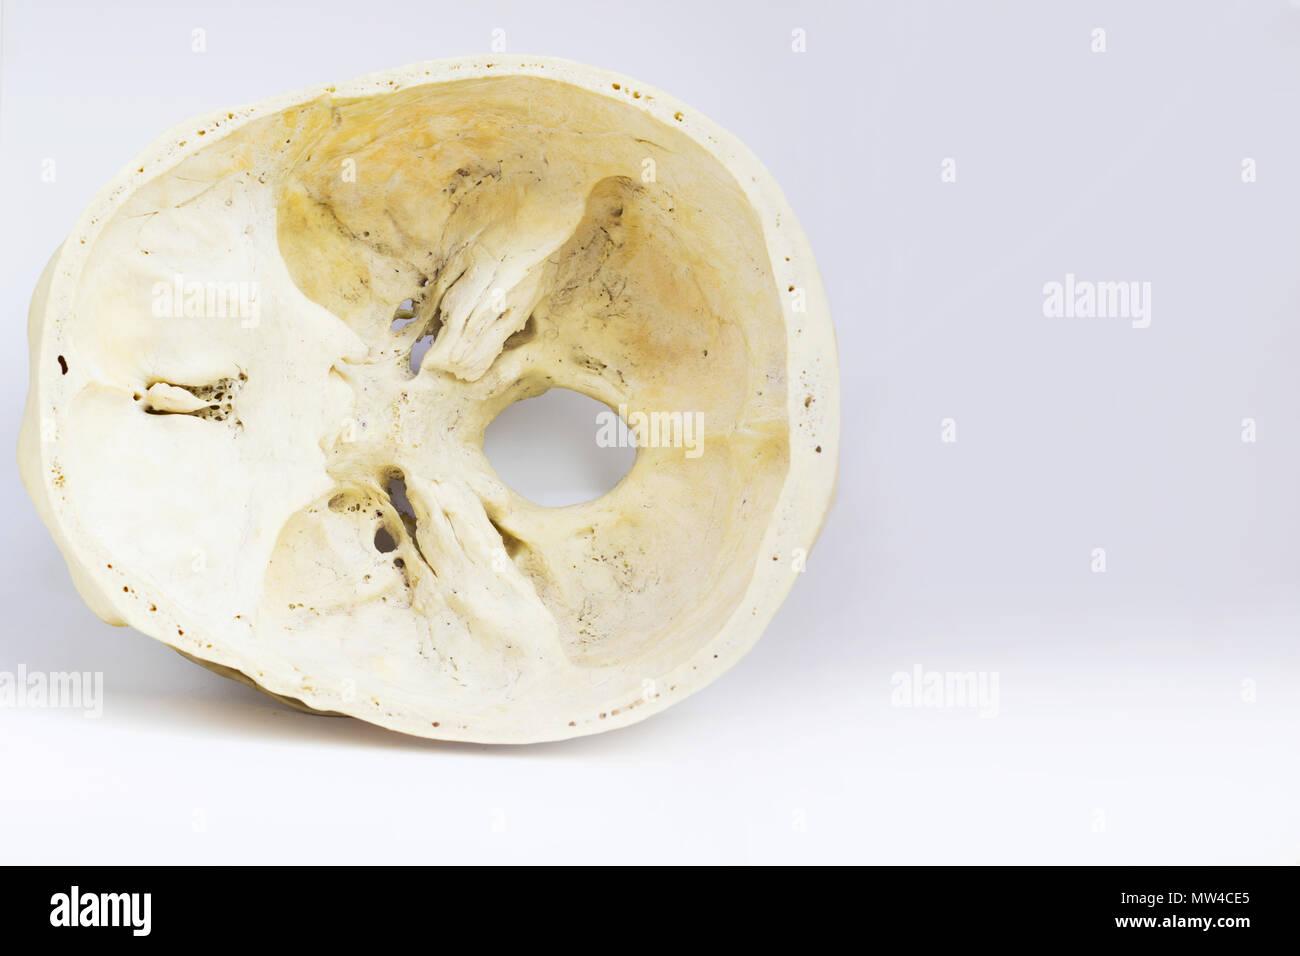 Skull Base Stockfotos & Skull Base Bilder - Alamy